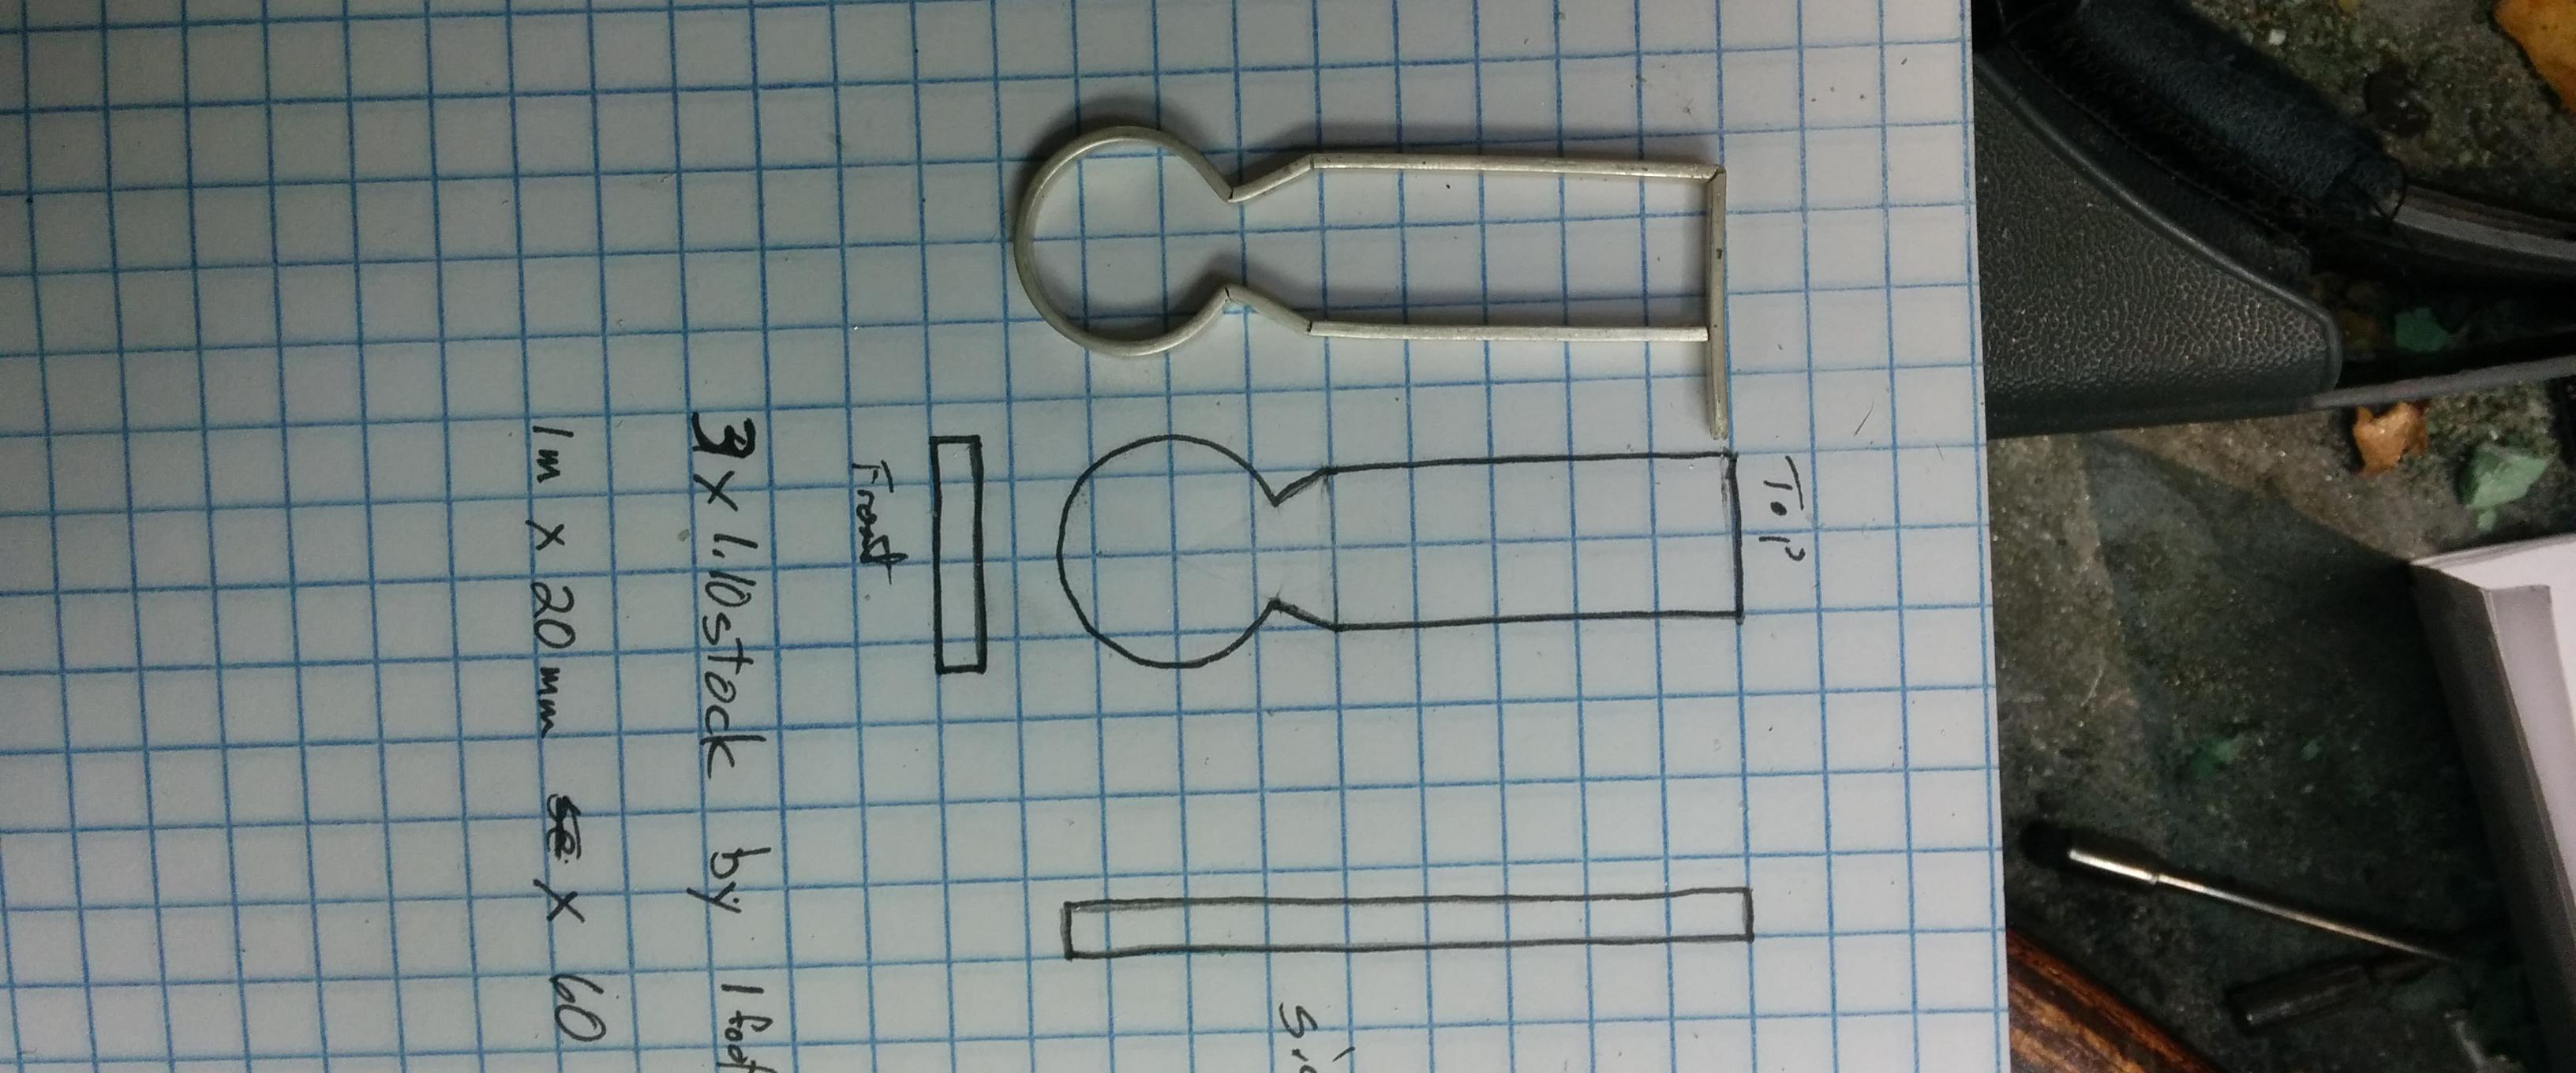 pendent frame for three hinge pendent